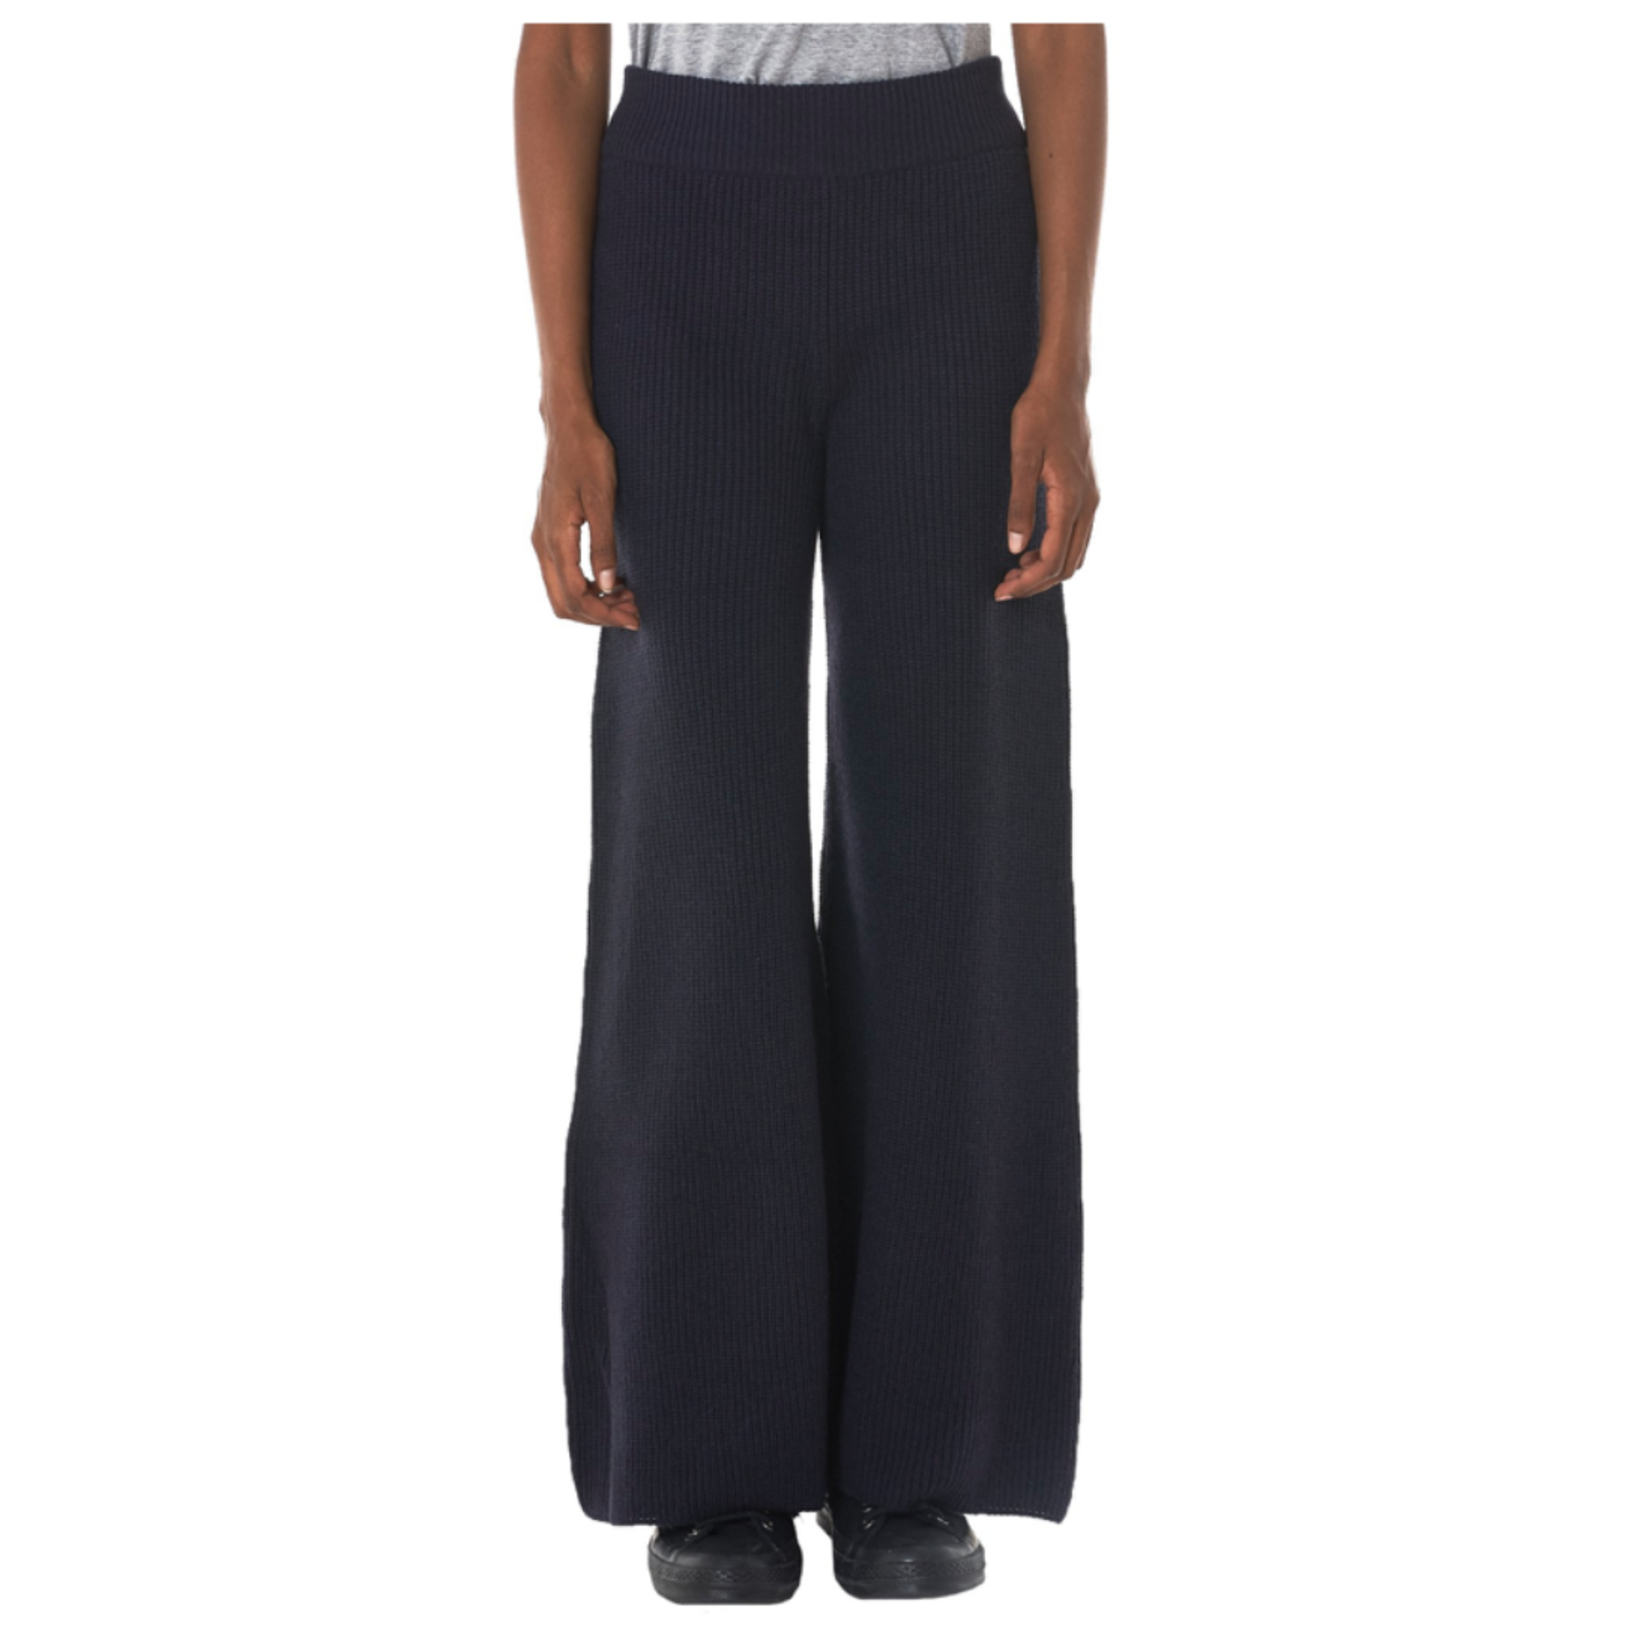 Arjé The Cortina Cashmere Blend Knit Pants